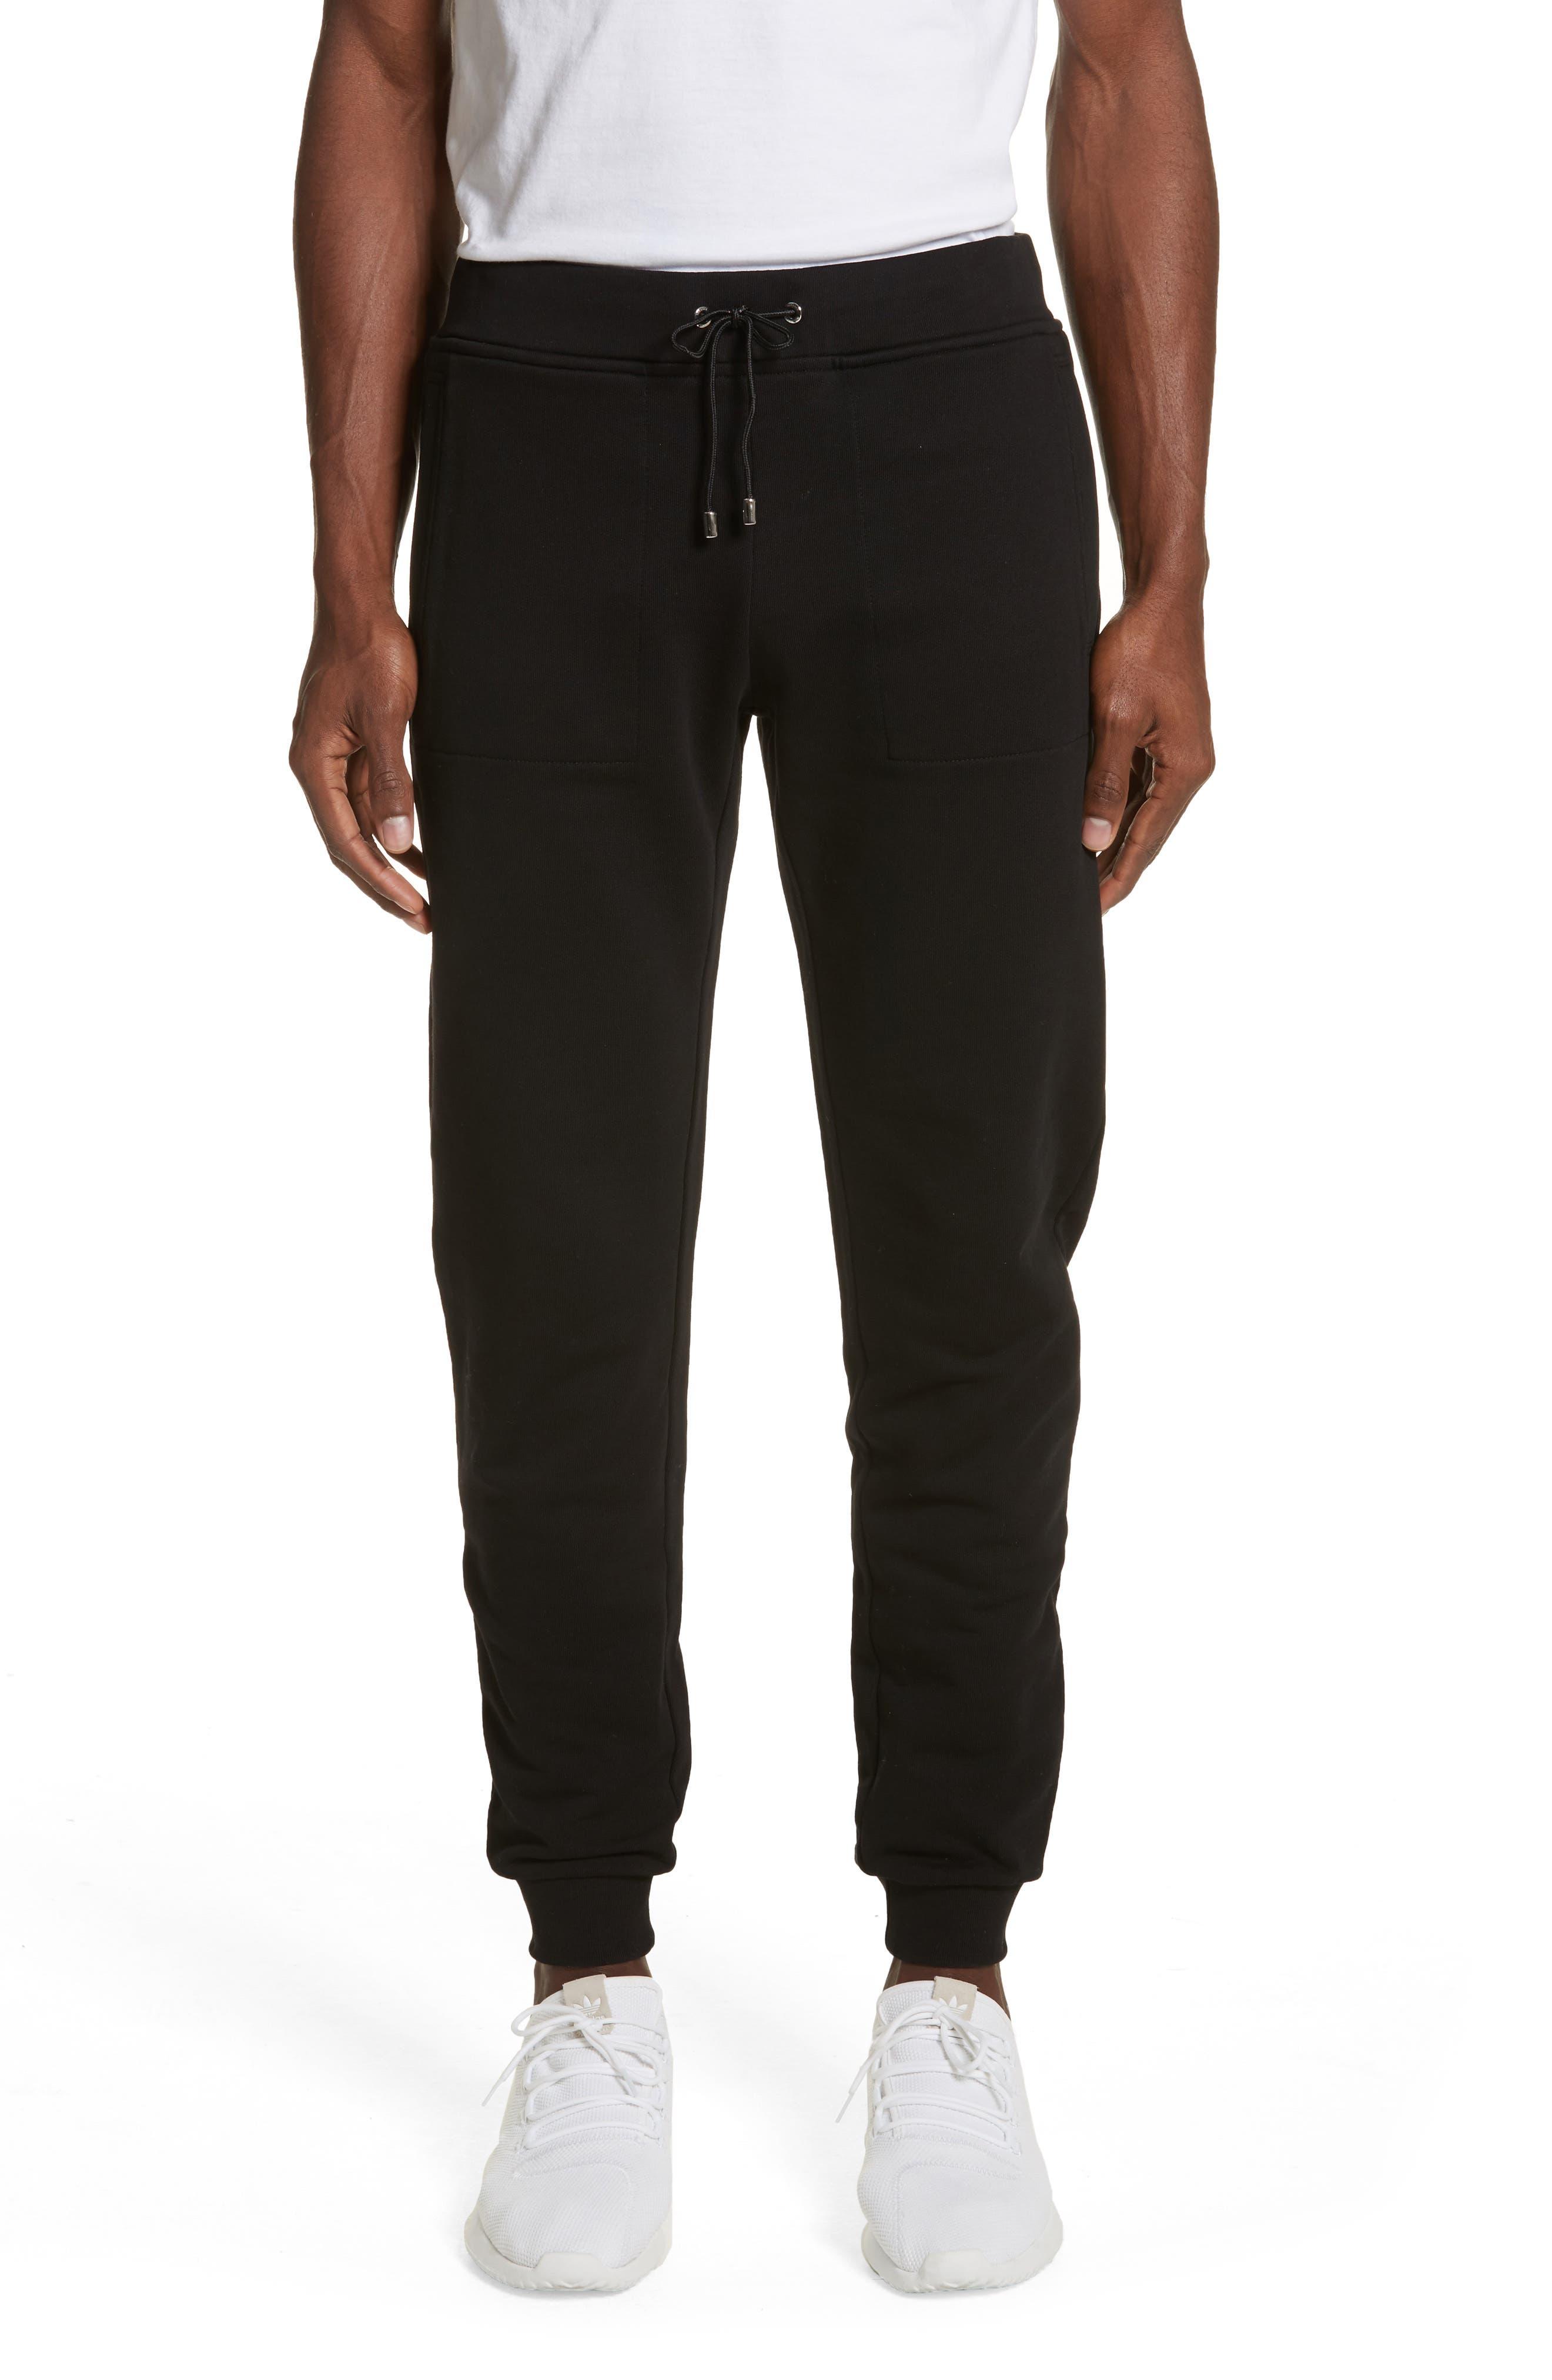 Medusa Embroidered Jogger Pants,                         Main,                         color, BLACK